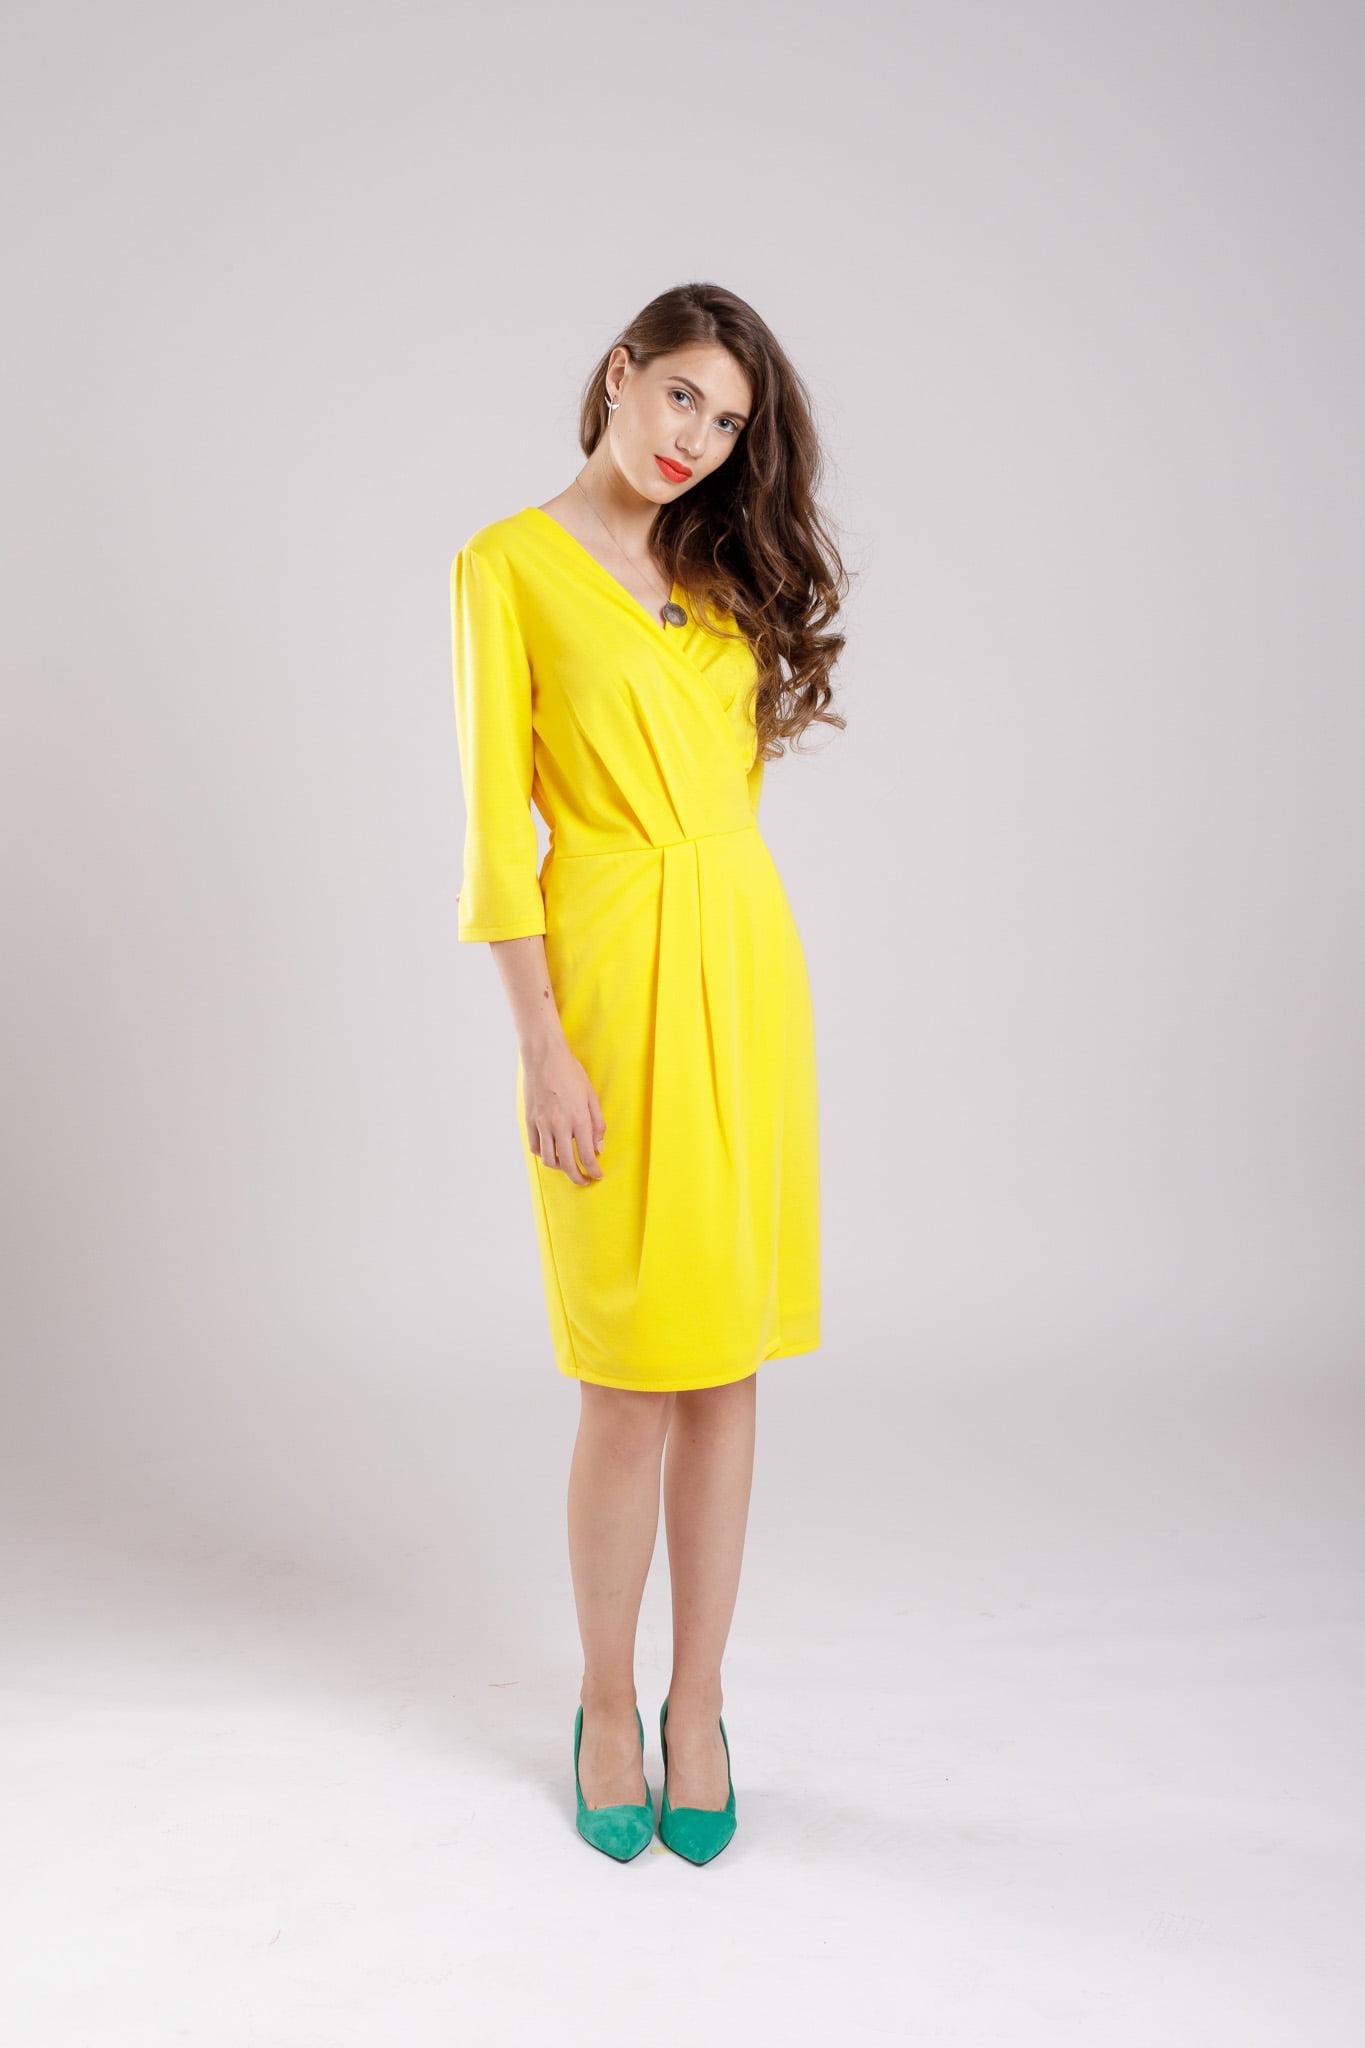 rochie petrecuta yellow dress